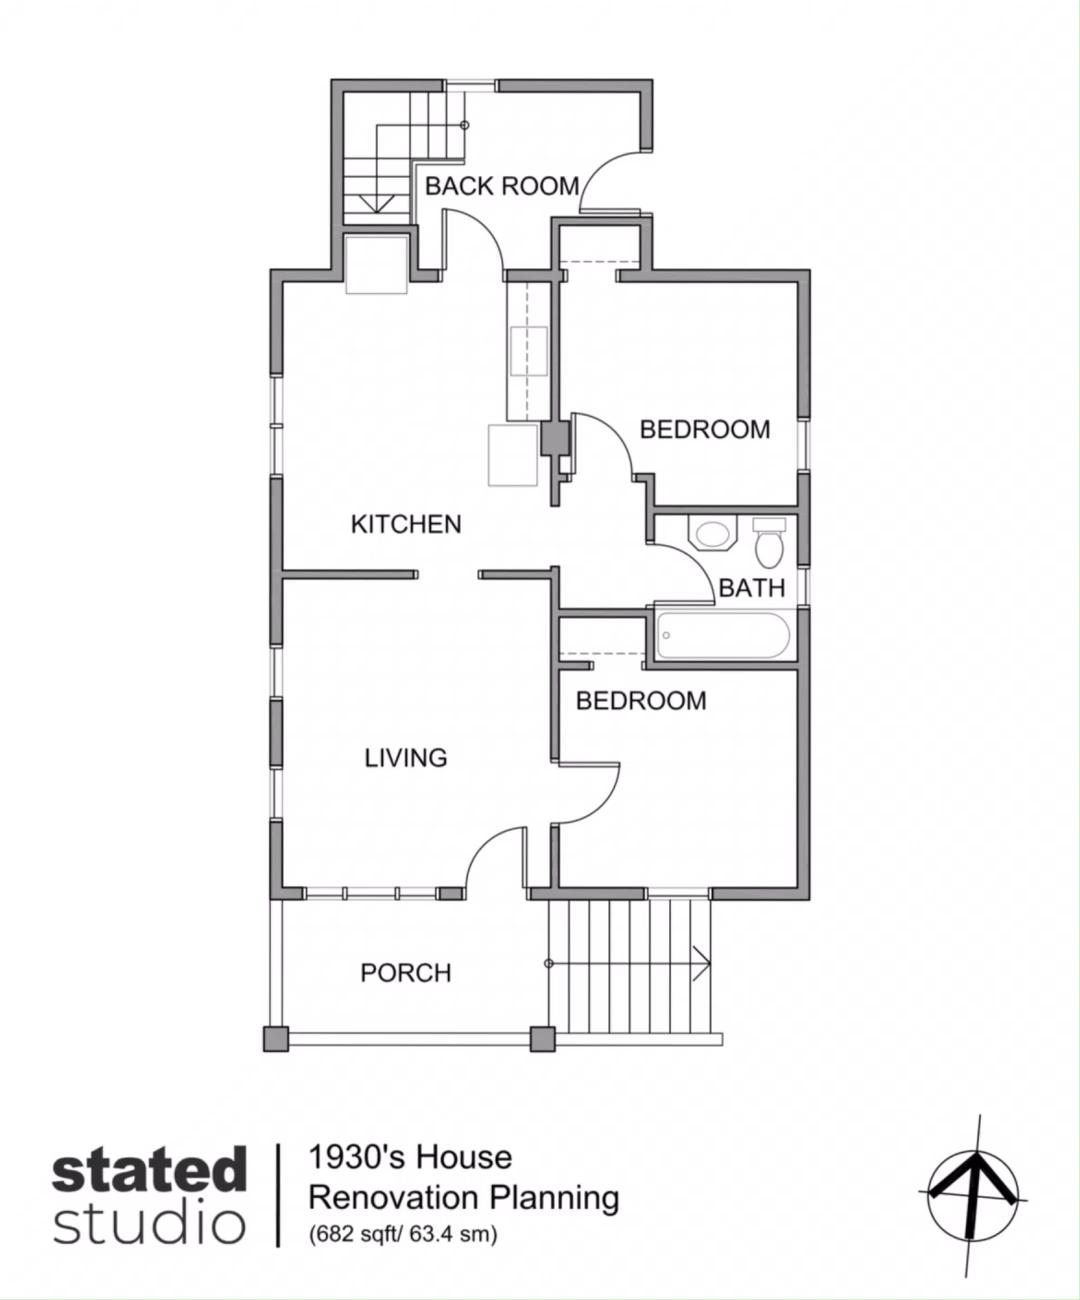 1930s House Reno Plan Home Design Floor Plans Garage House Plans Architectural Floor Plans